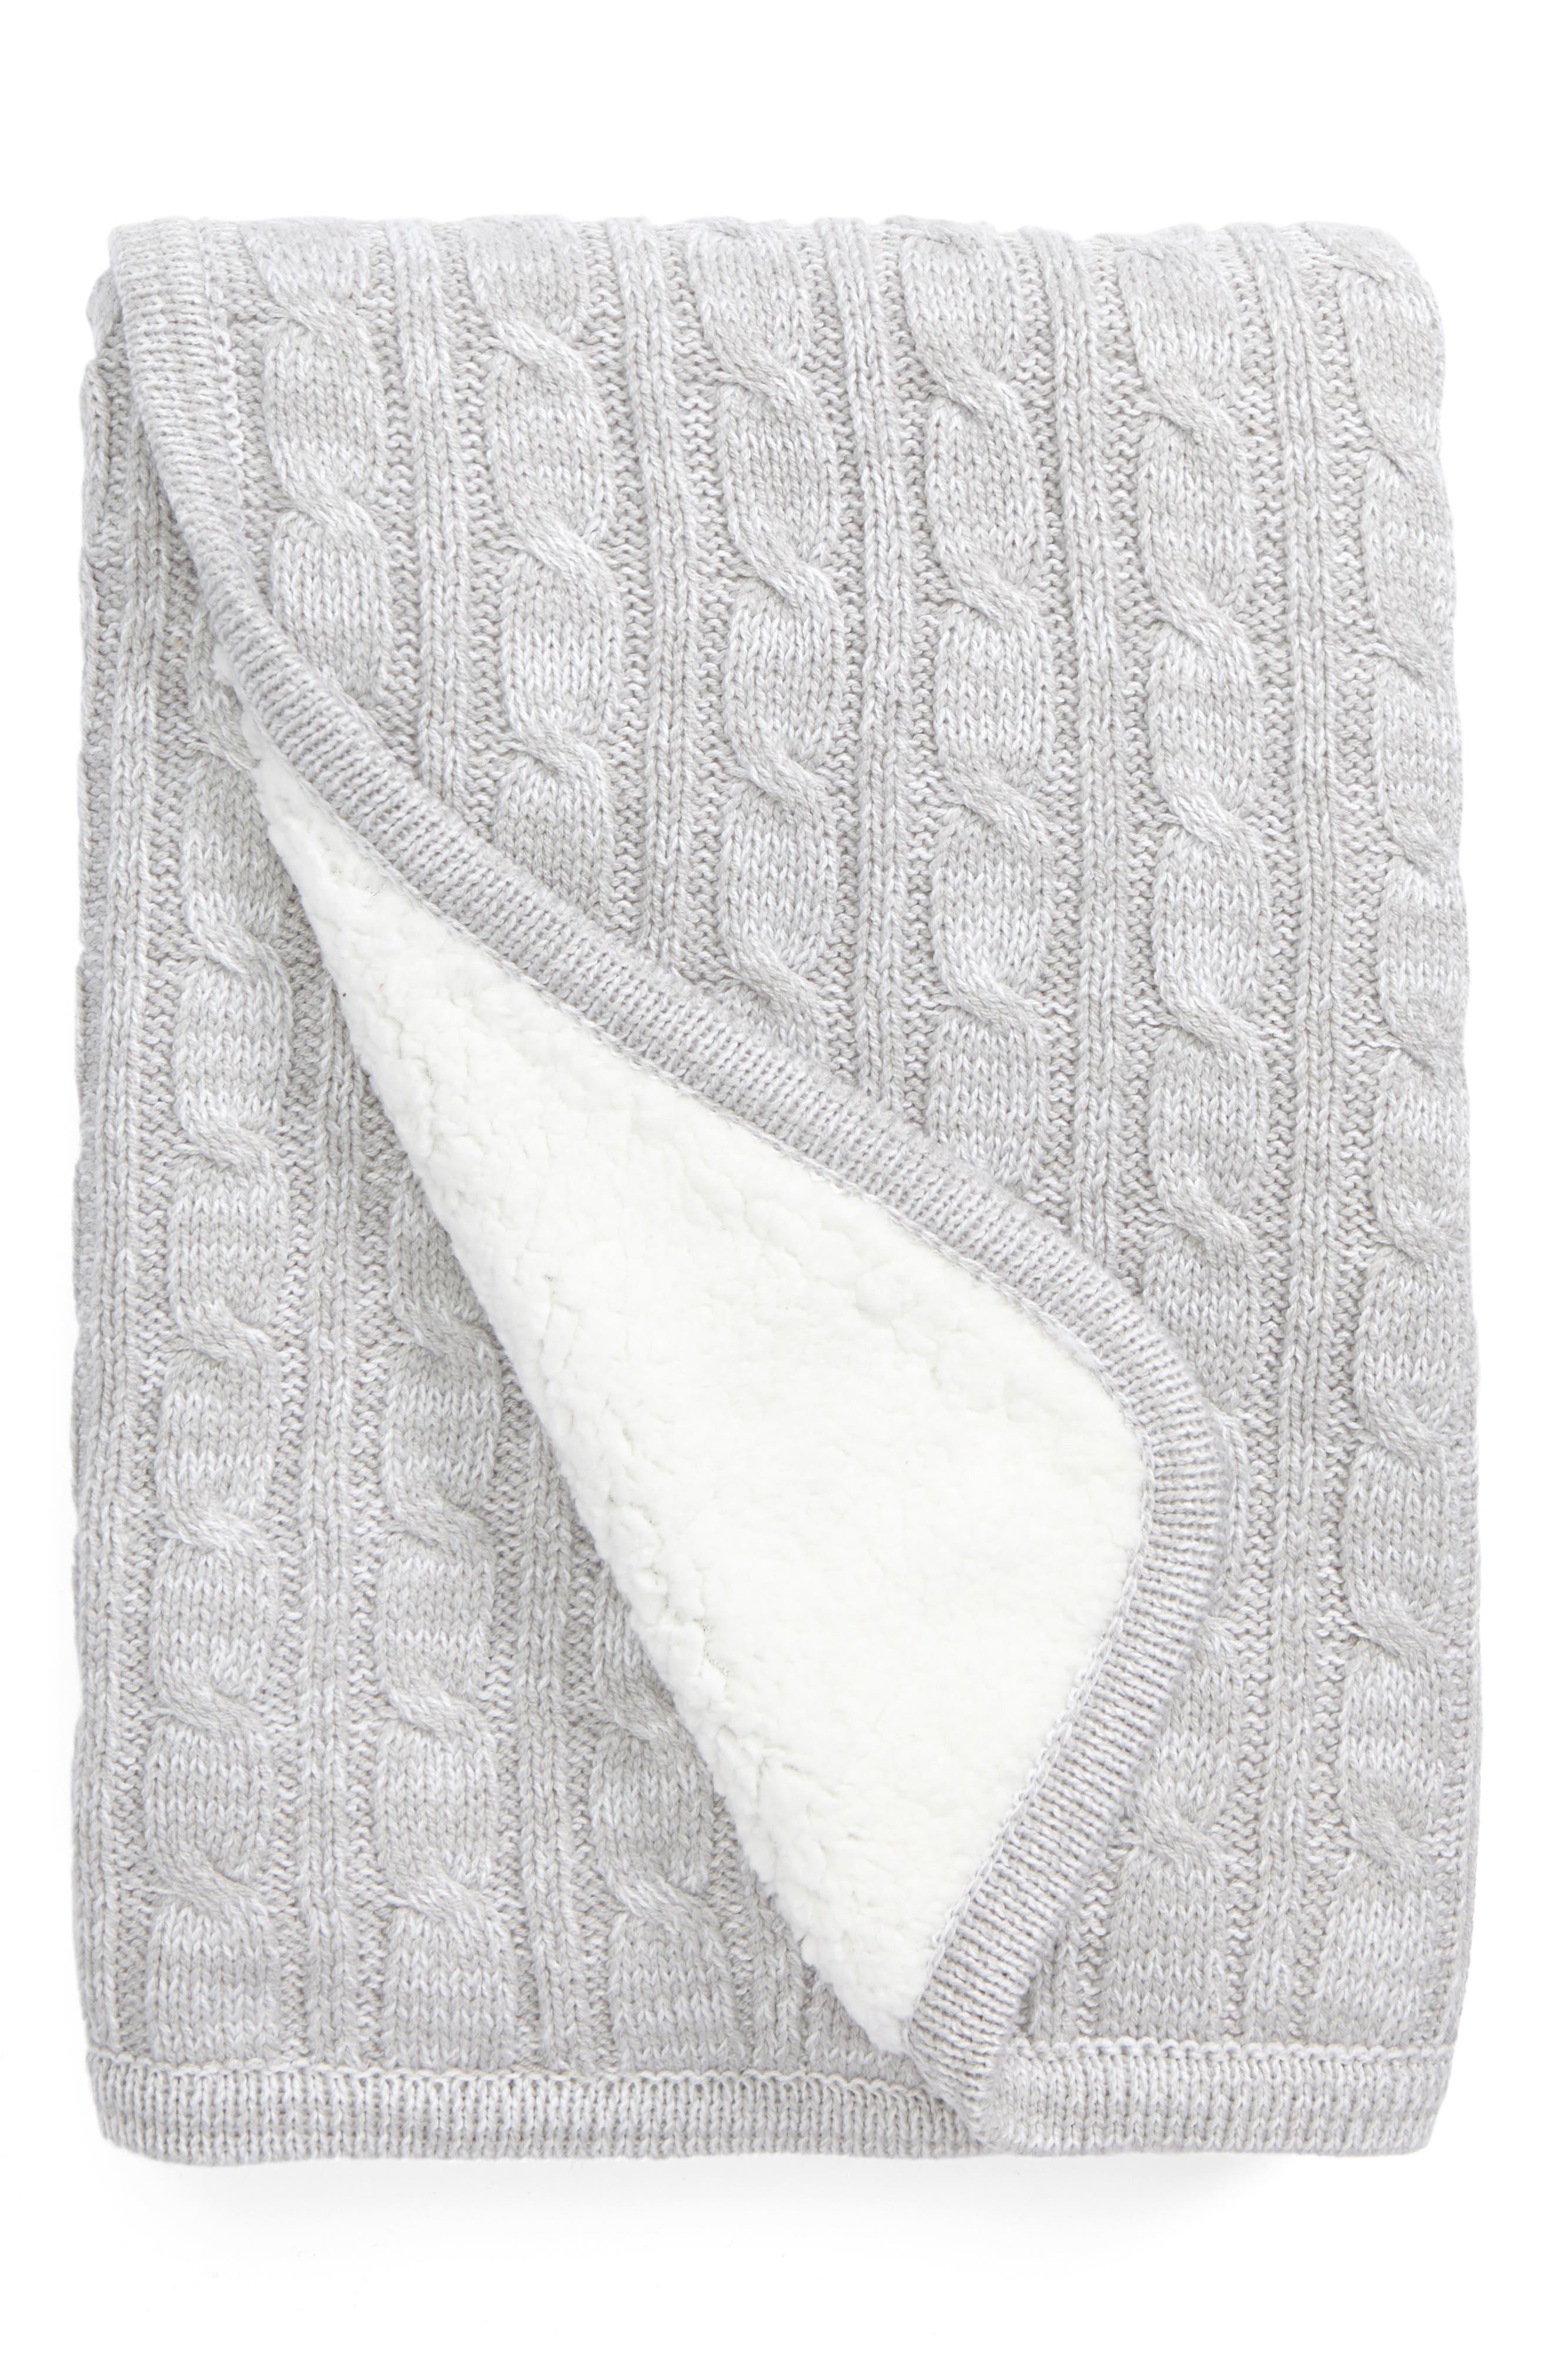 Cable Knit Blanket,                             Main thumbnail 1, color,                             050